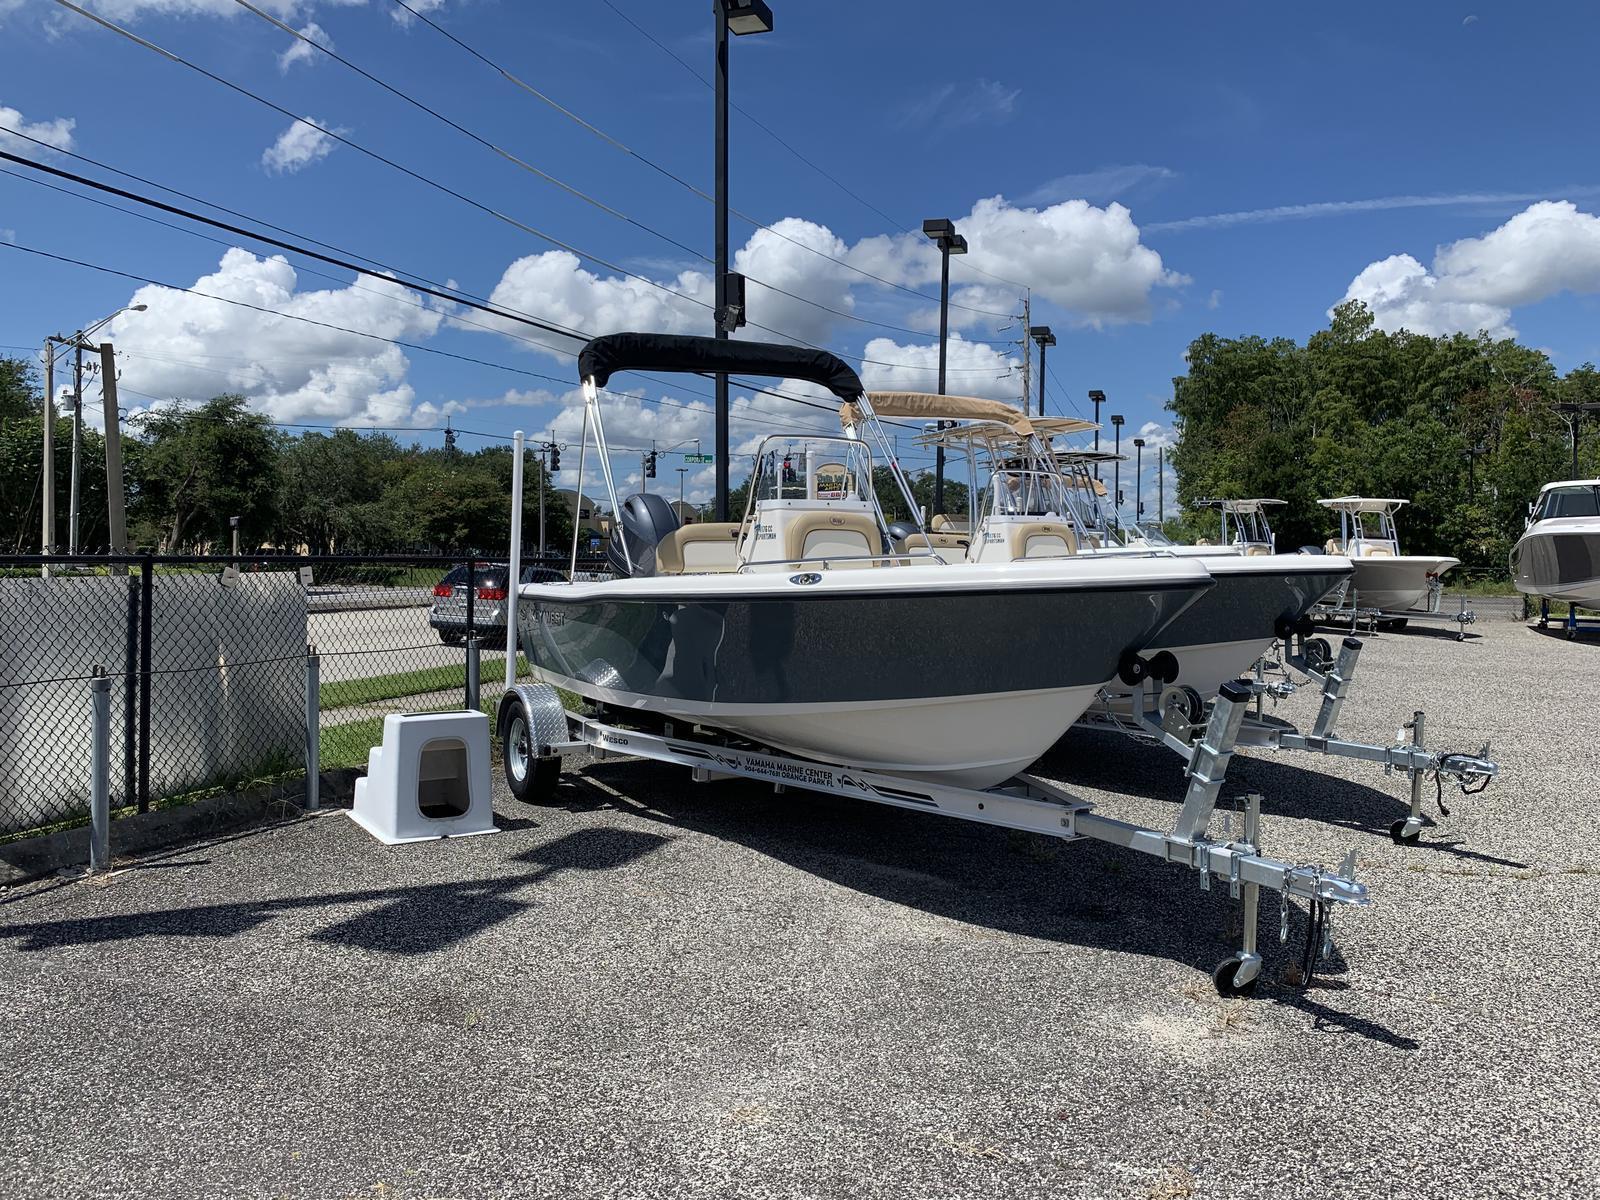 Inventory Yamaha Marine Center Orange Park, FL (904) 644-7631